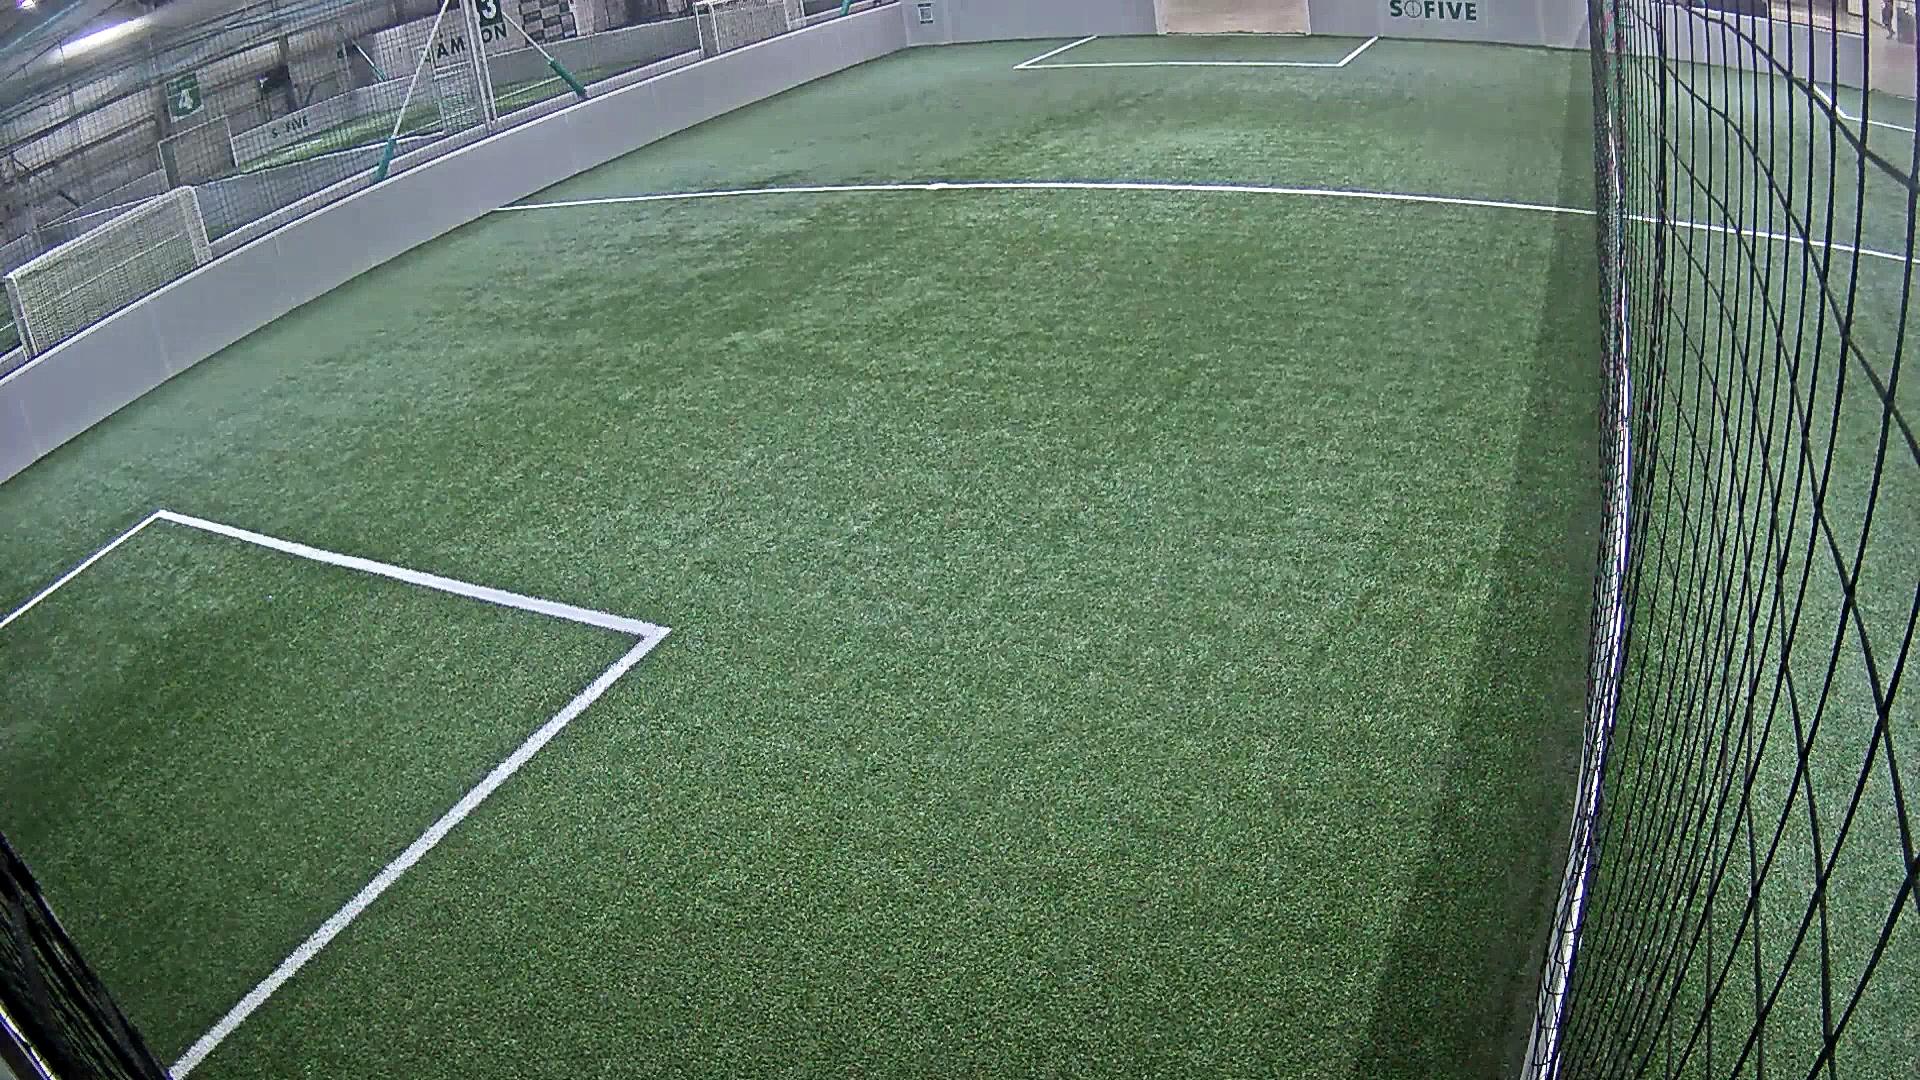 09/15/2019 13:00:02 - Sofive Soccer Centers Rockville - Santiago Bernabeu